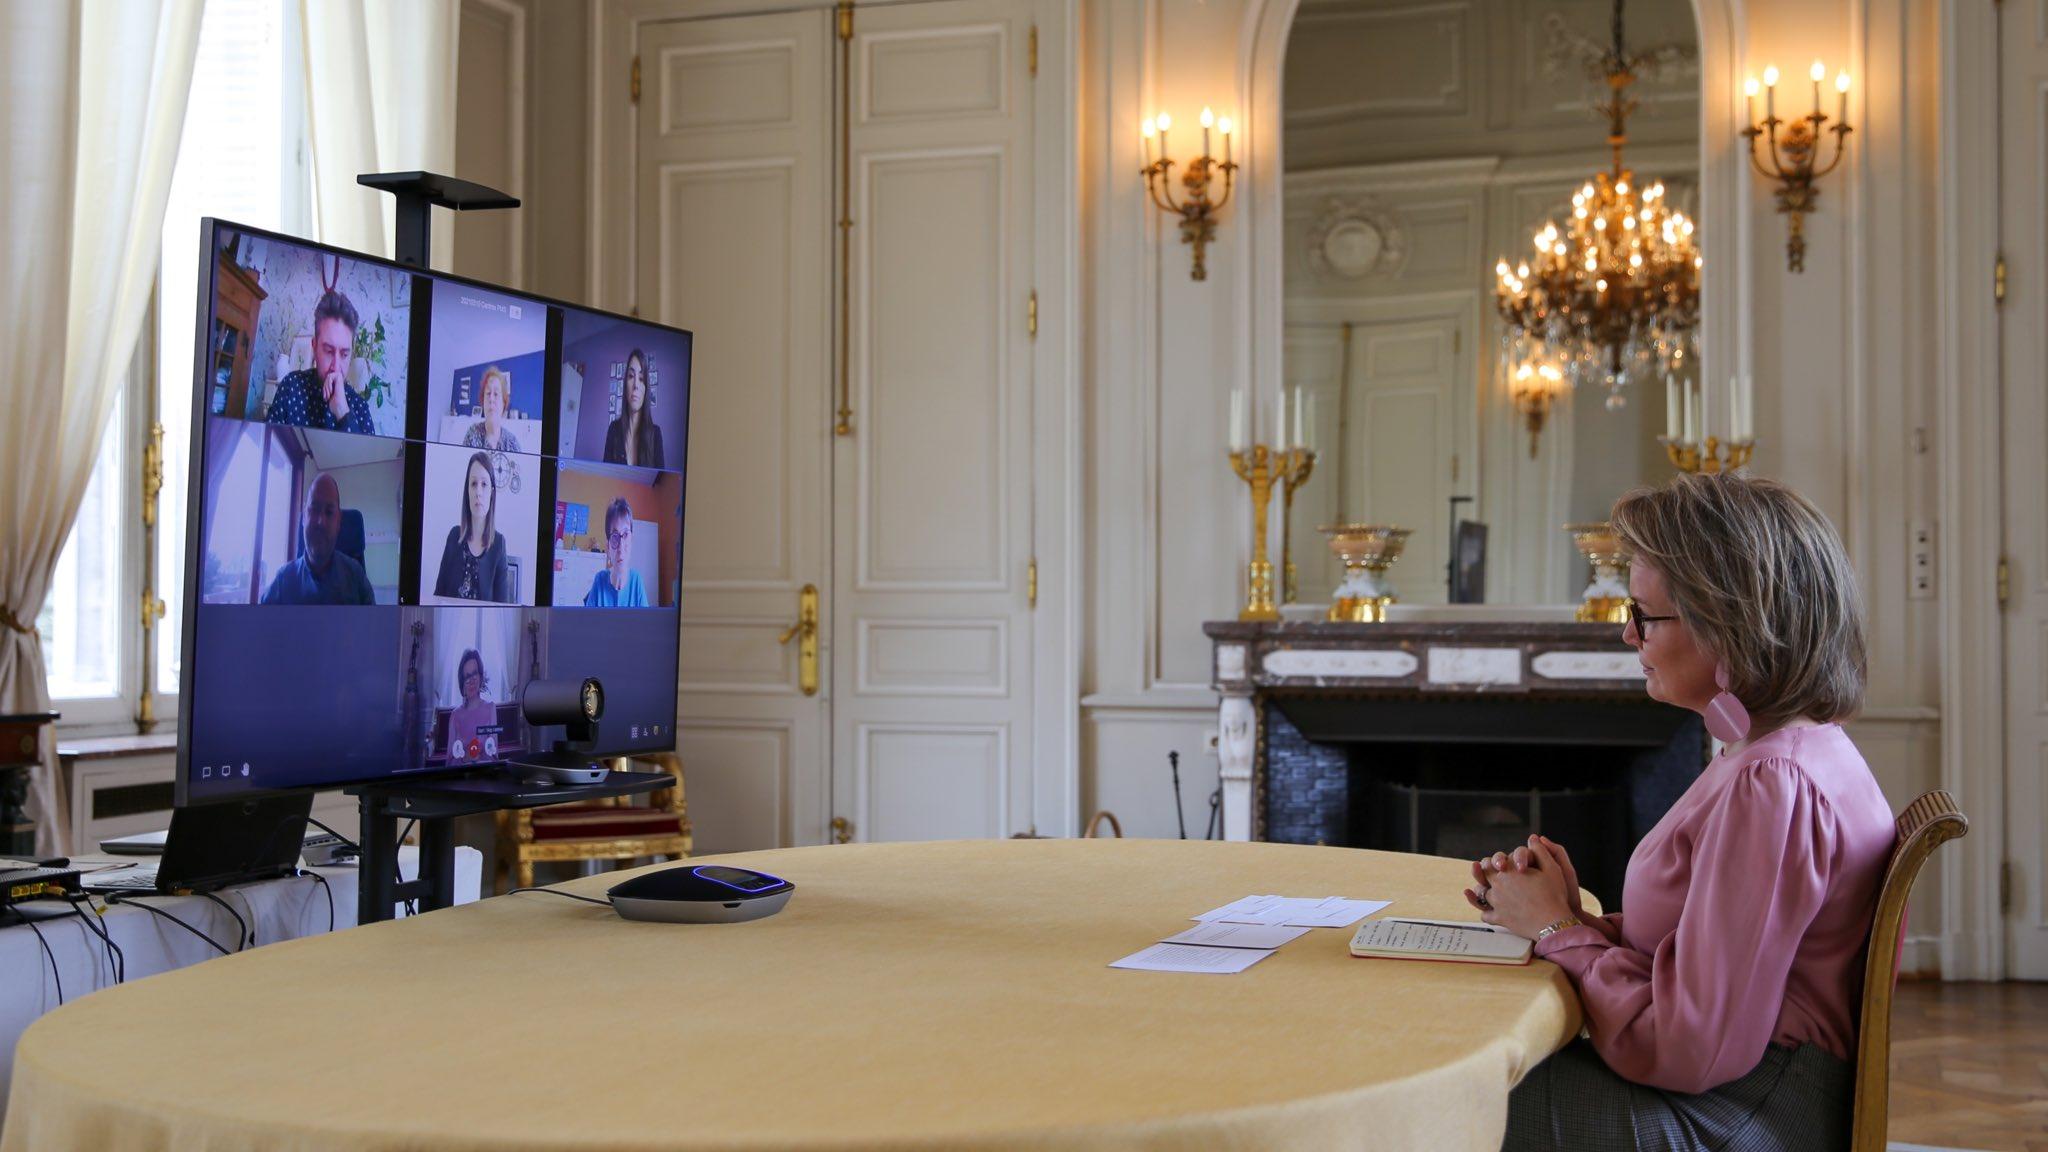 Belgium Queen Mathilde held multiple virtual calls at the Royal Palace. The Queen has a virtual conversation with representatives of various 'Centers Psycho-Médico-Sociaux'